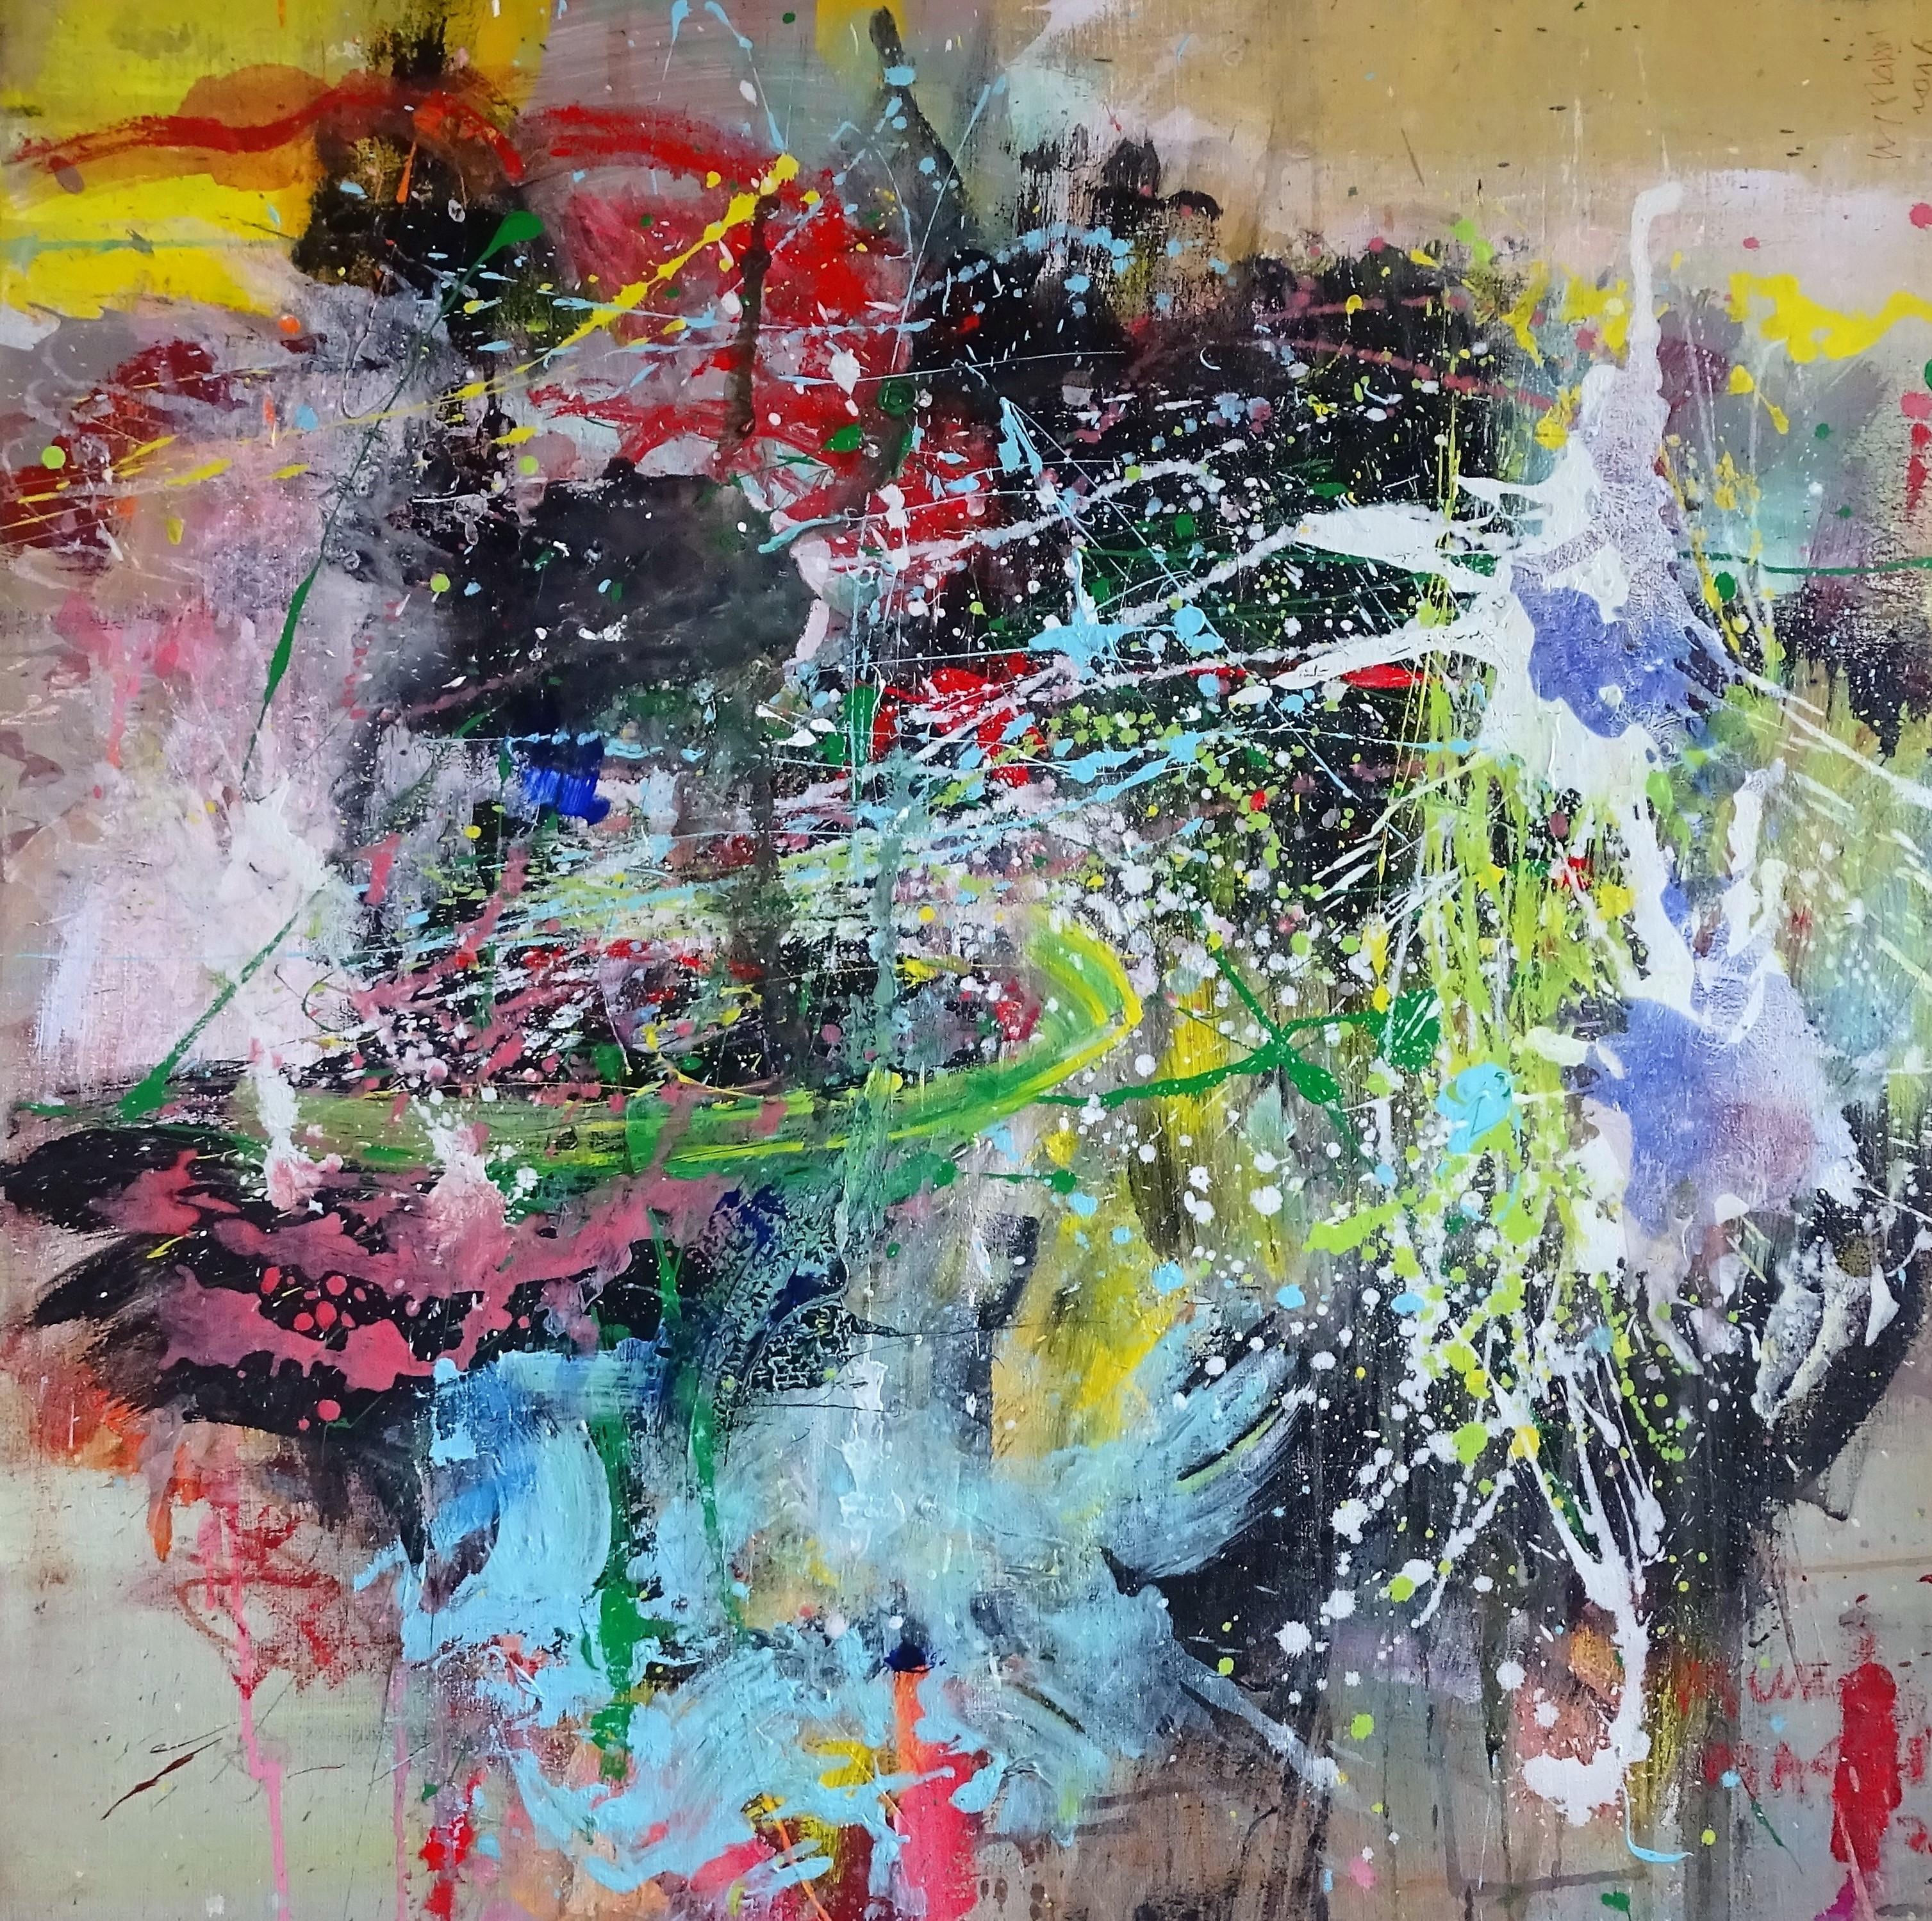 happy colours -100x100 cm- Eine_Art_ Gallery, Brems (Germany)